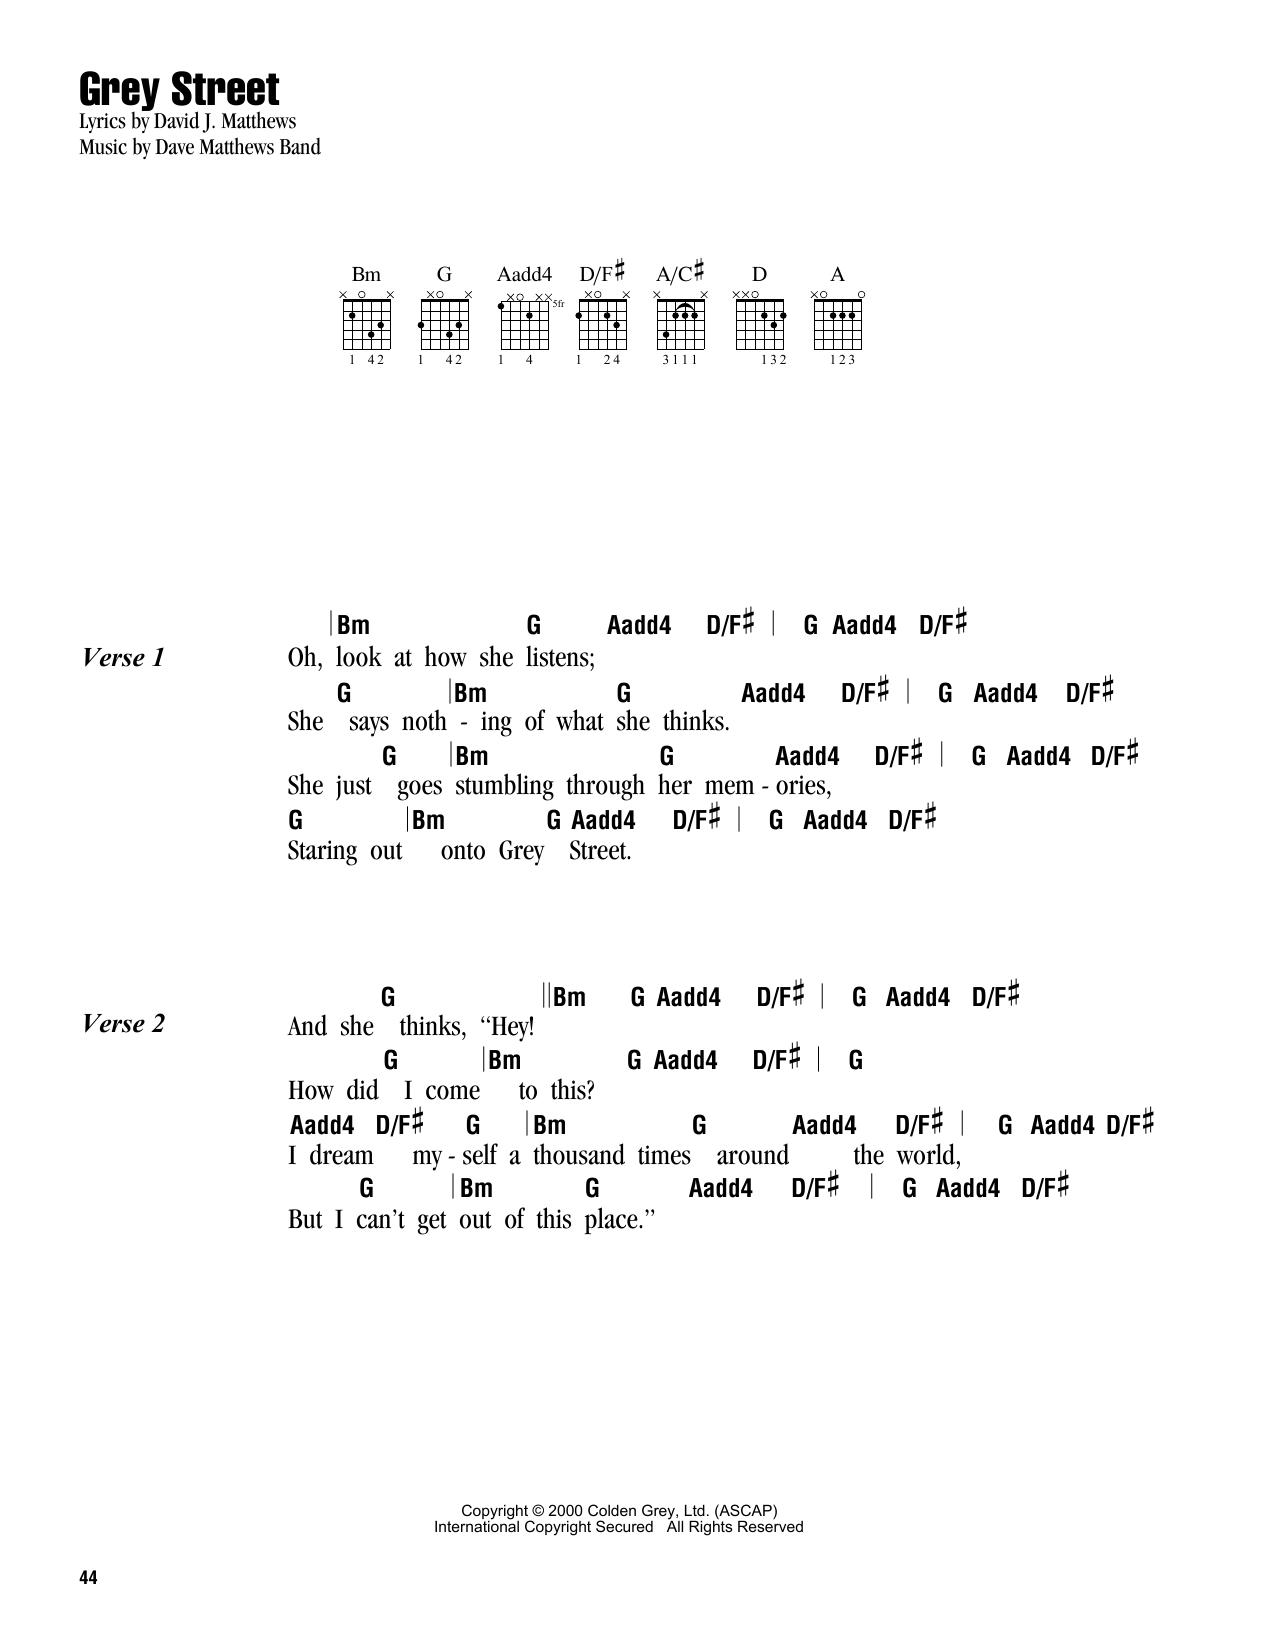 Grey Street by Dave Matthews Band - Guitar Chords/Lyrics - Guitar Instructor